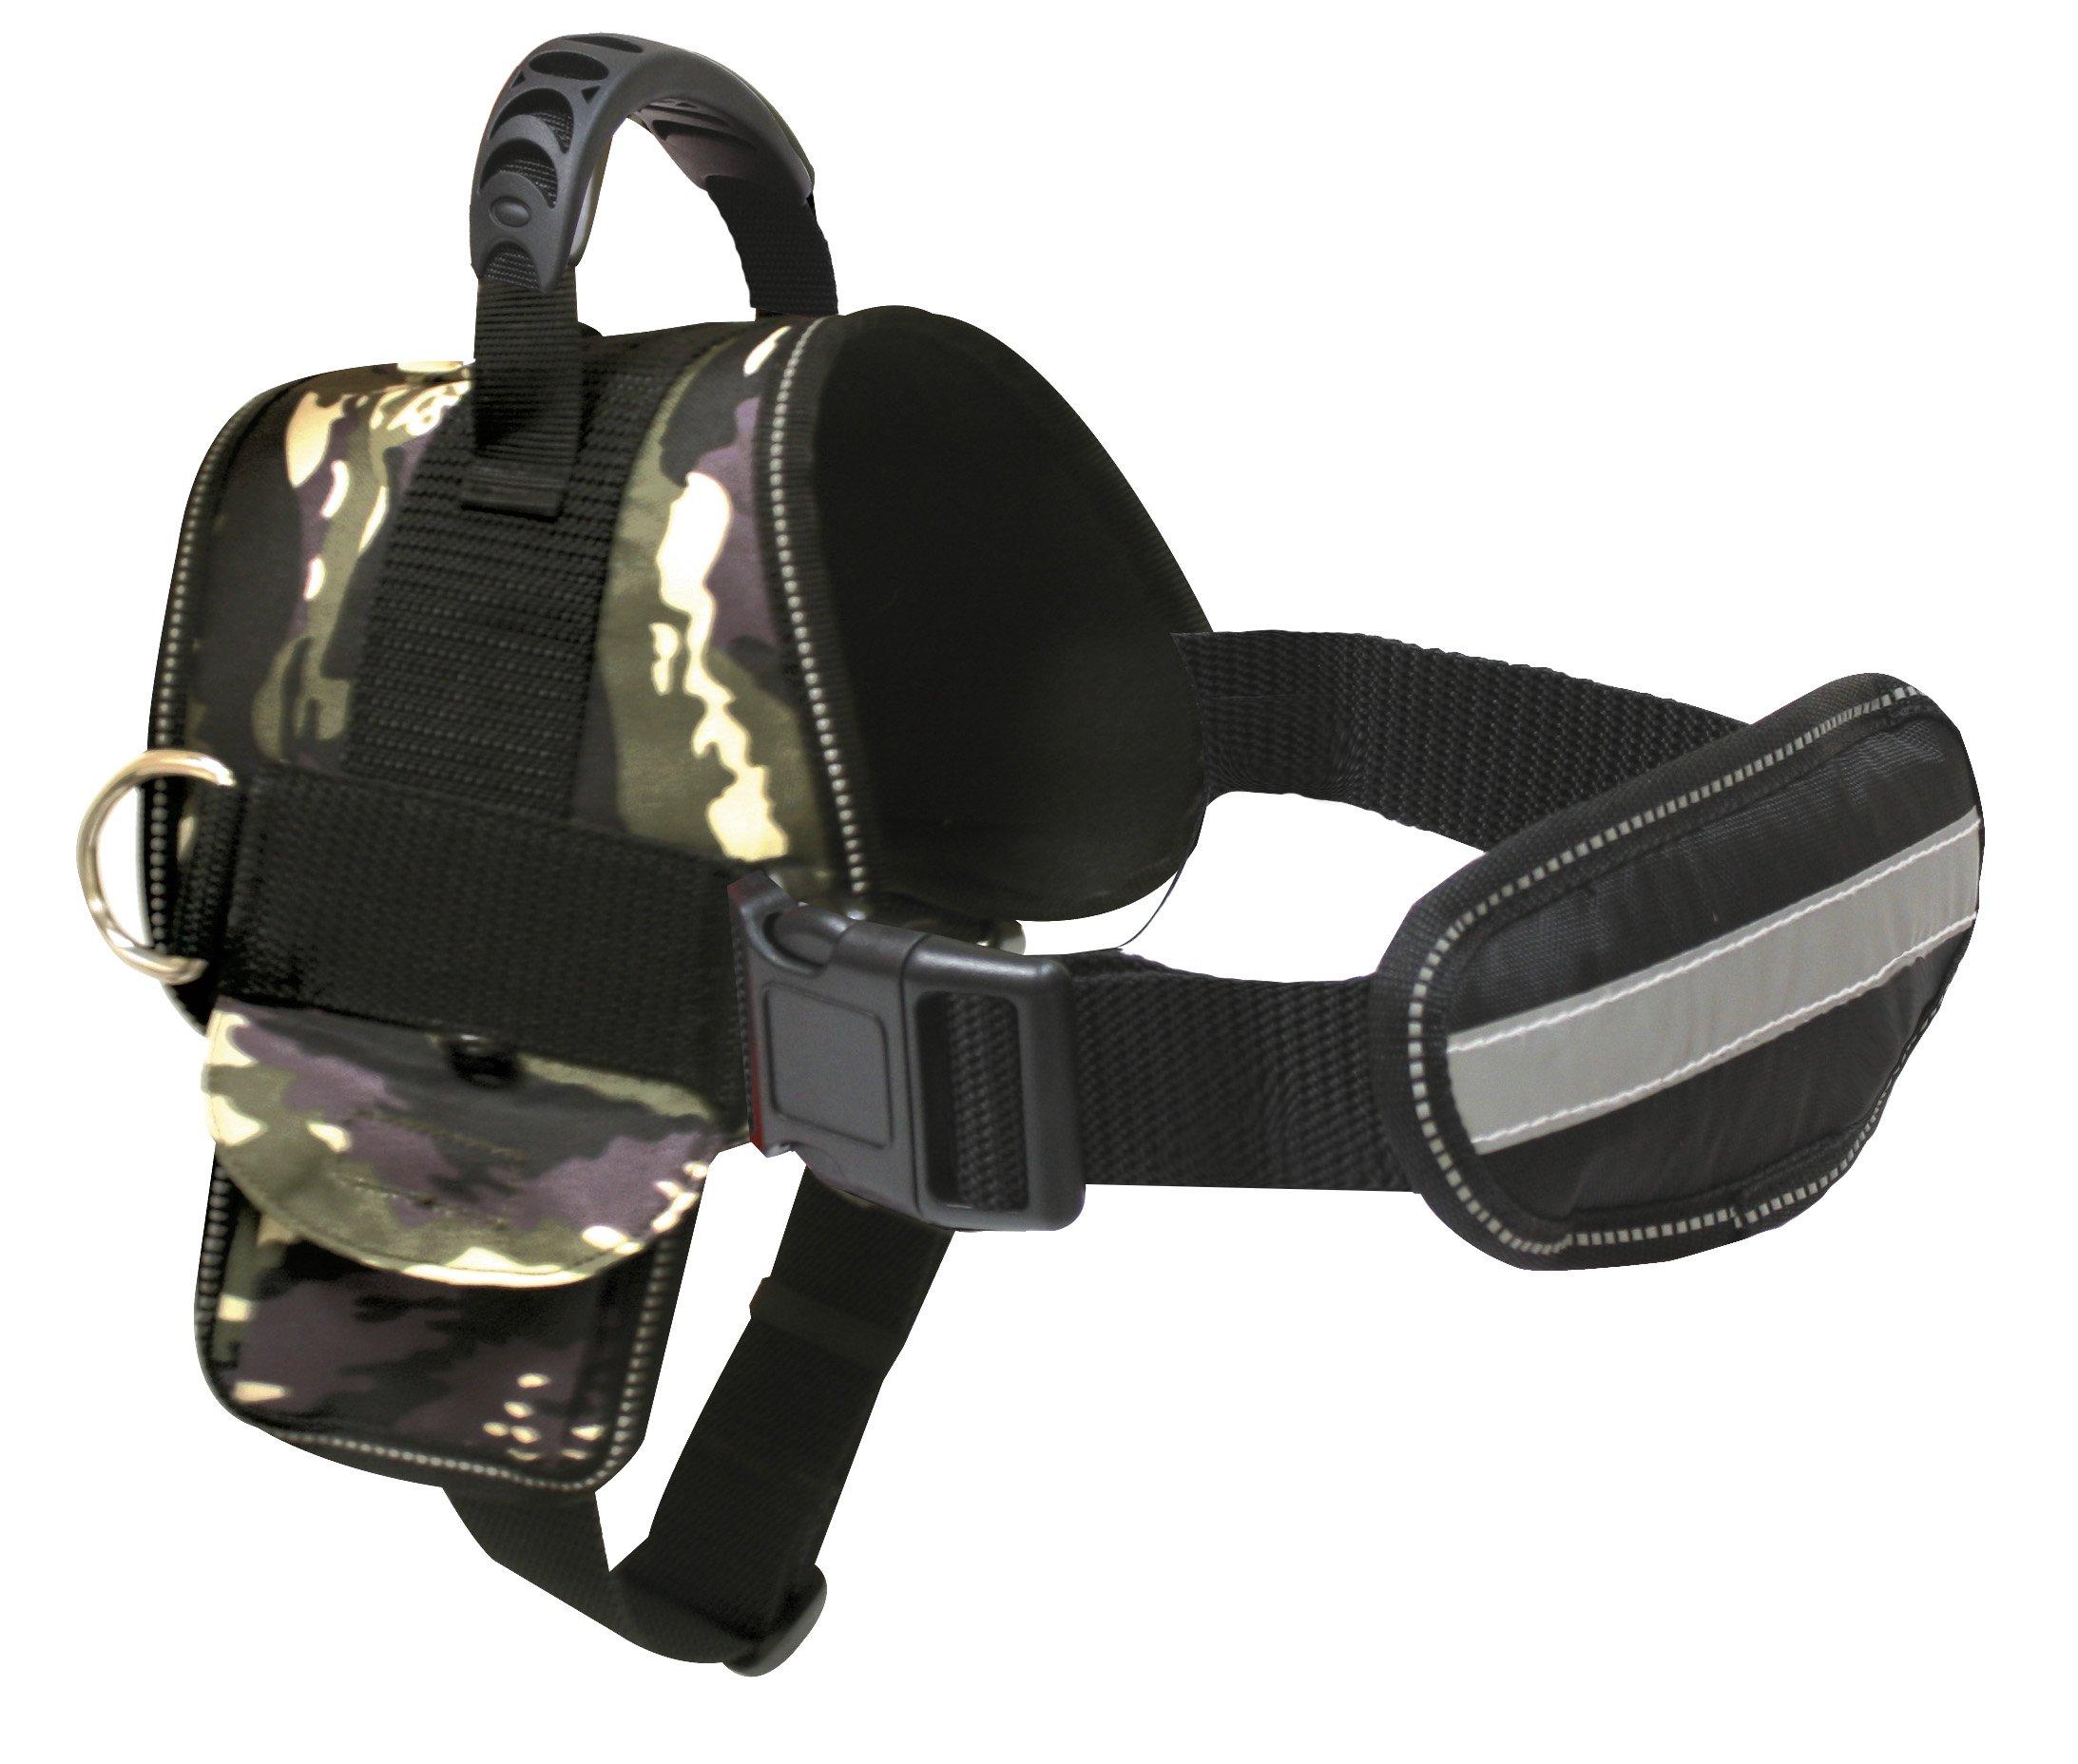 CROCI Hiking Swat Harness, 73-100 cm by CROCI